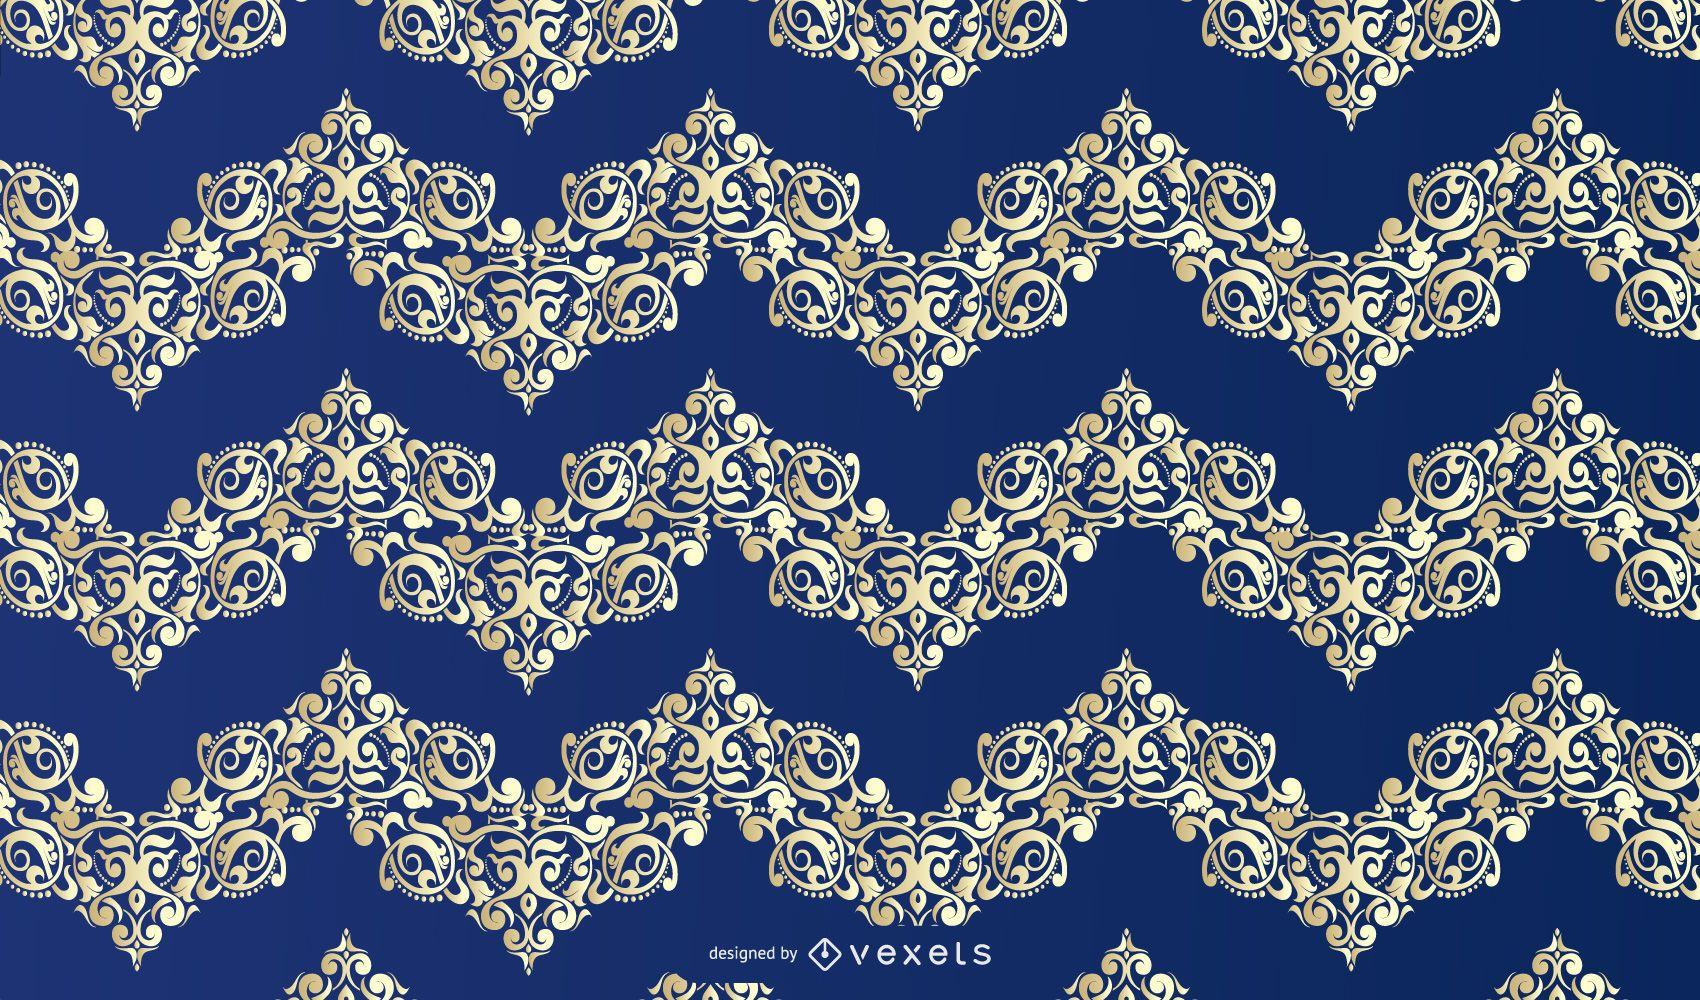 Patrón de ornamento floral de oro azul